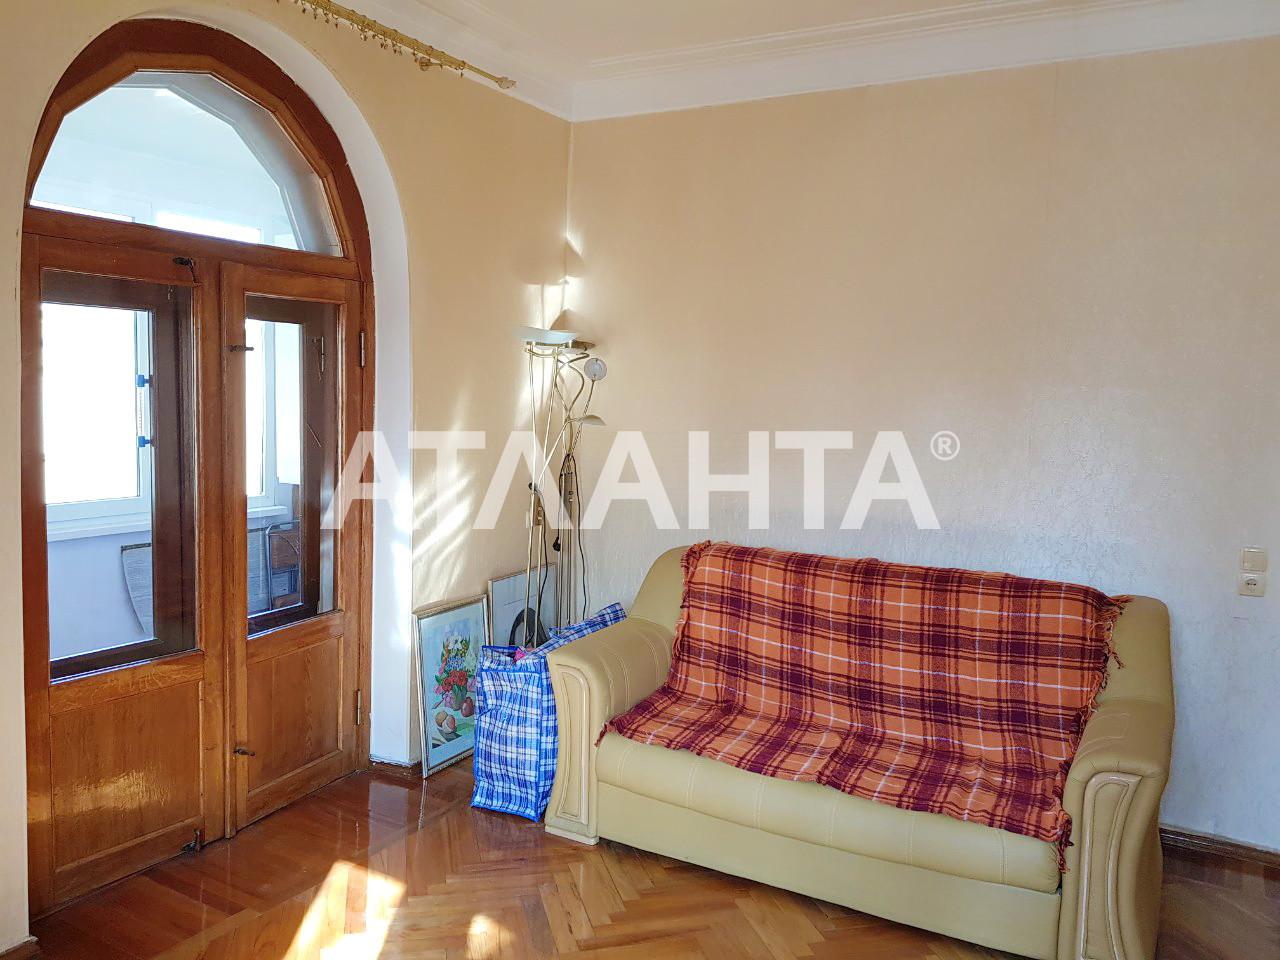 Сдается 2-комнатная Квартира на ул. Семинарская (Гамарника) — 400 у.е./мес. (фото №9)